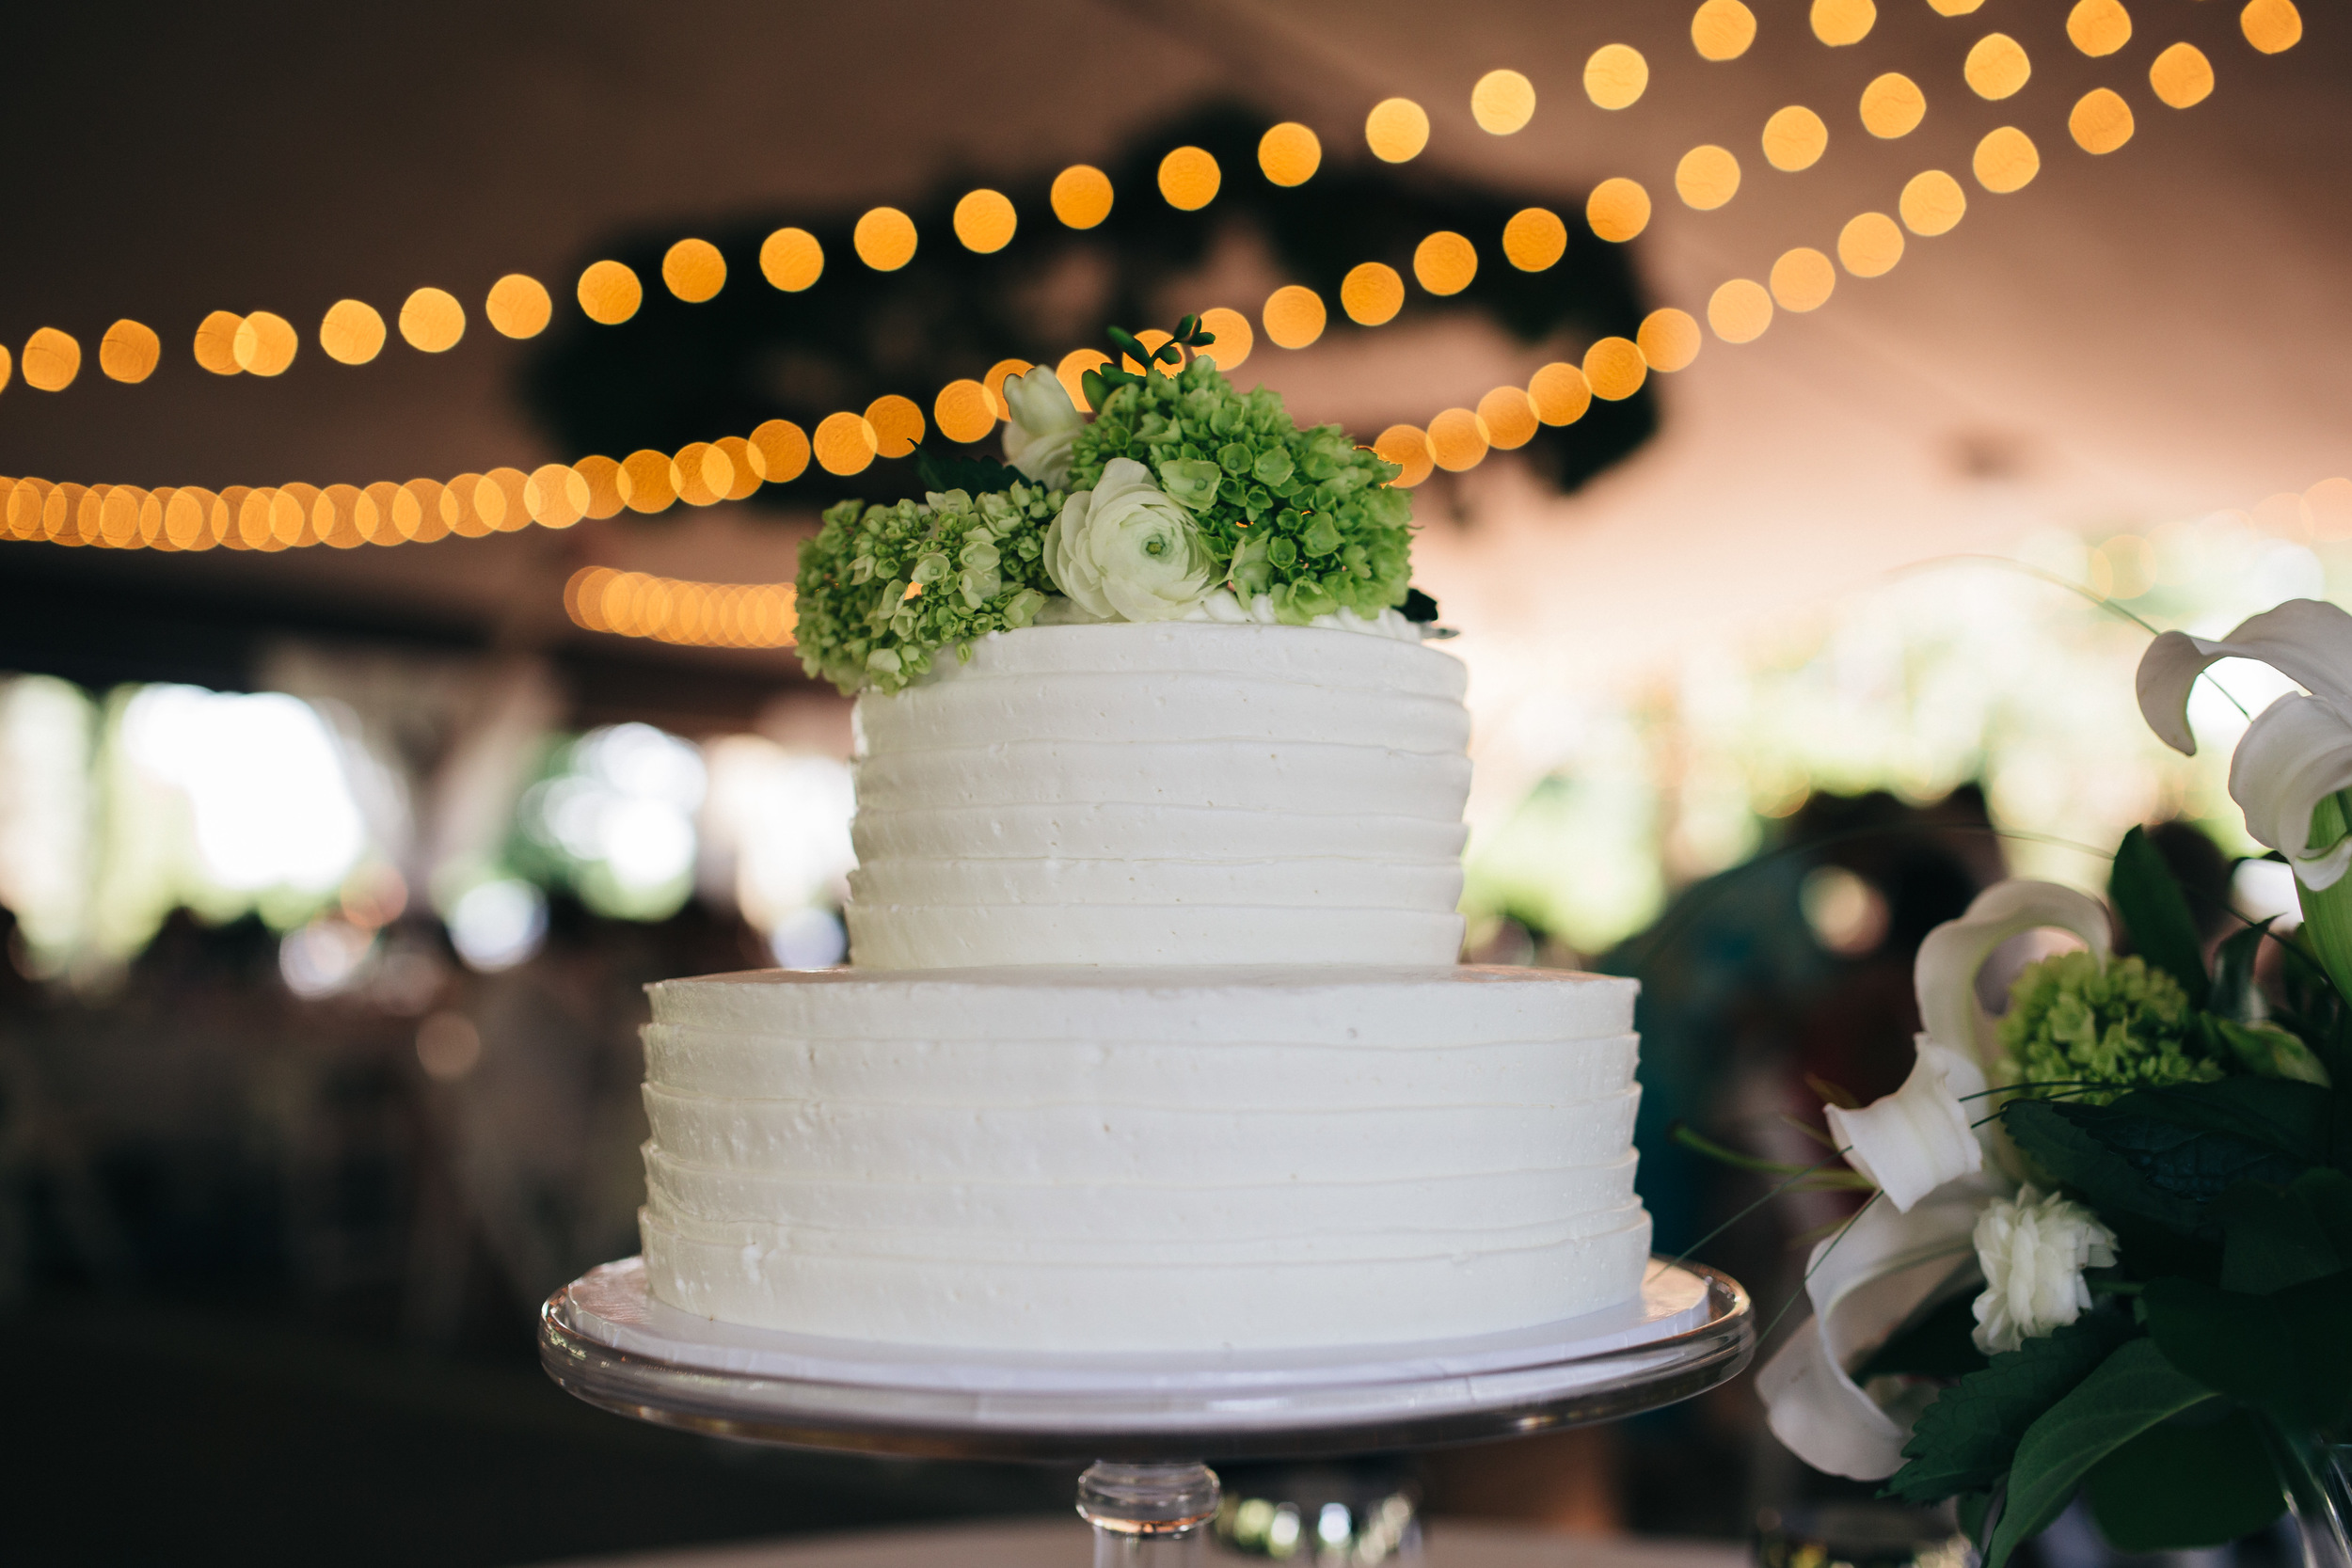 White wedding cake at wedding reception from Eston's Bakery.